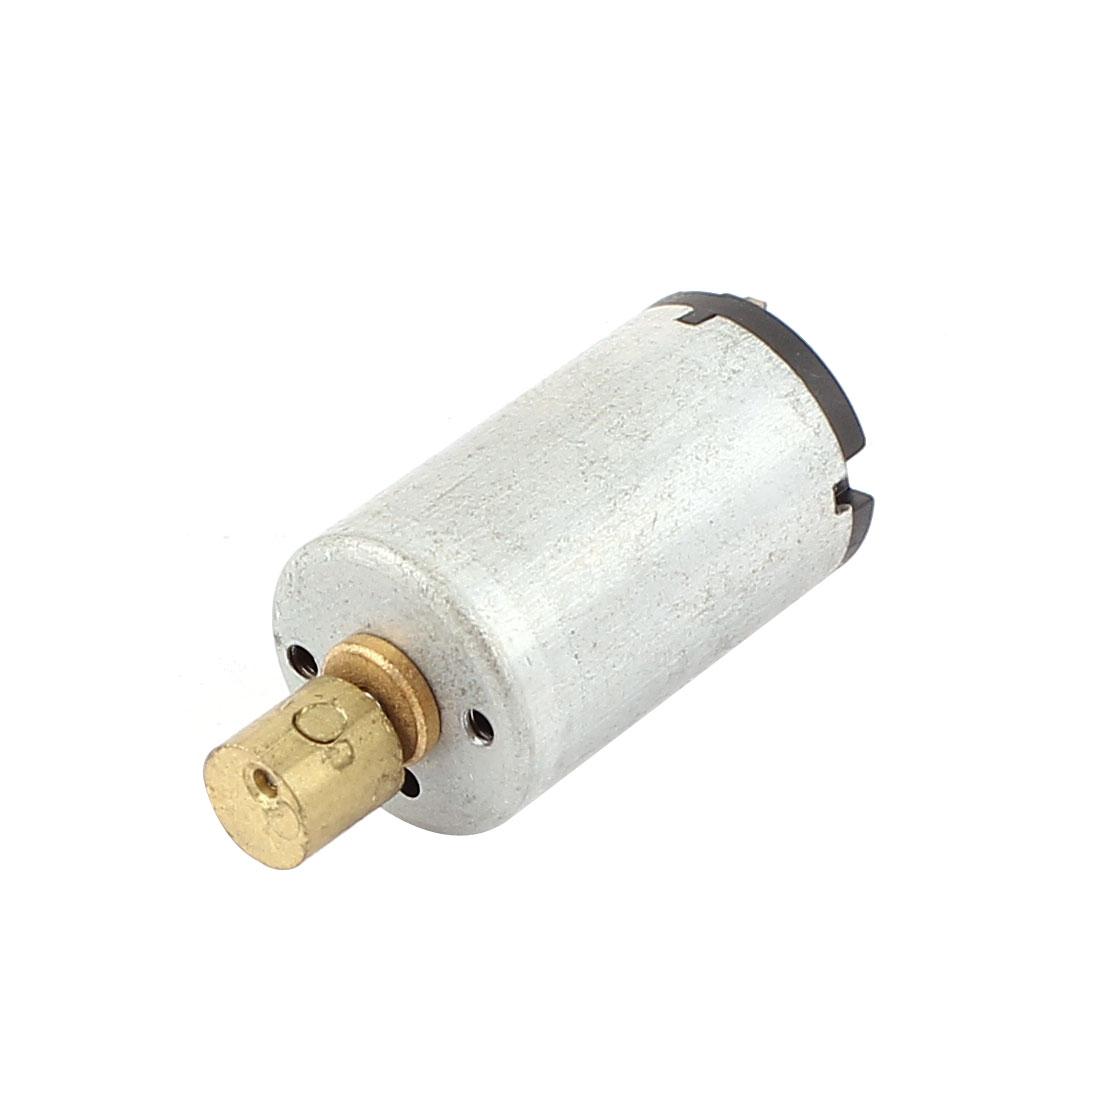 DC 1.25-3.7V 22000RPM High Speed Mini Micro Vibration Motor for Massager